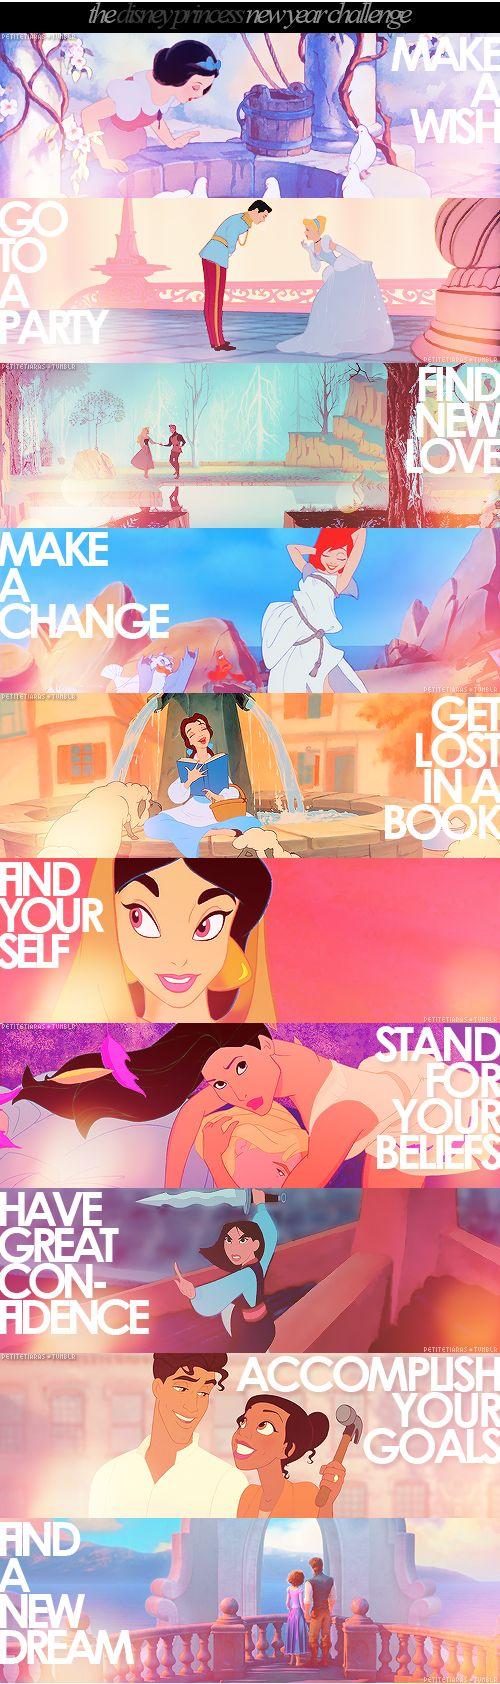 The Disney Princess New Year Challenge